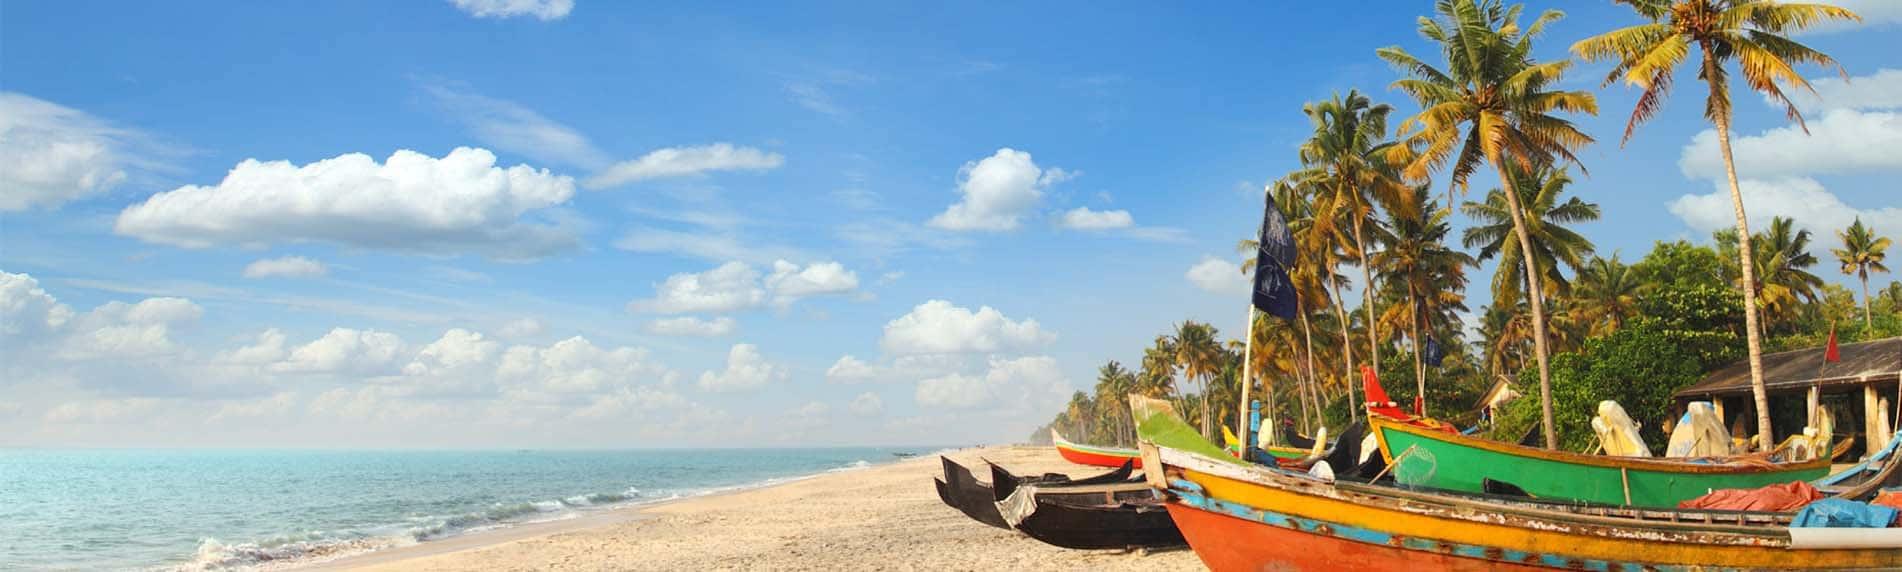 Stunning Goa Delights 5 Nights 6 Days